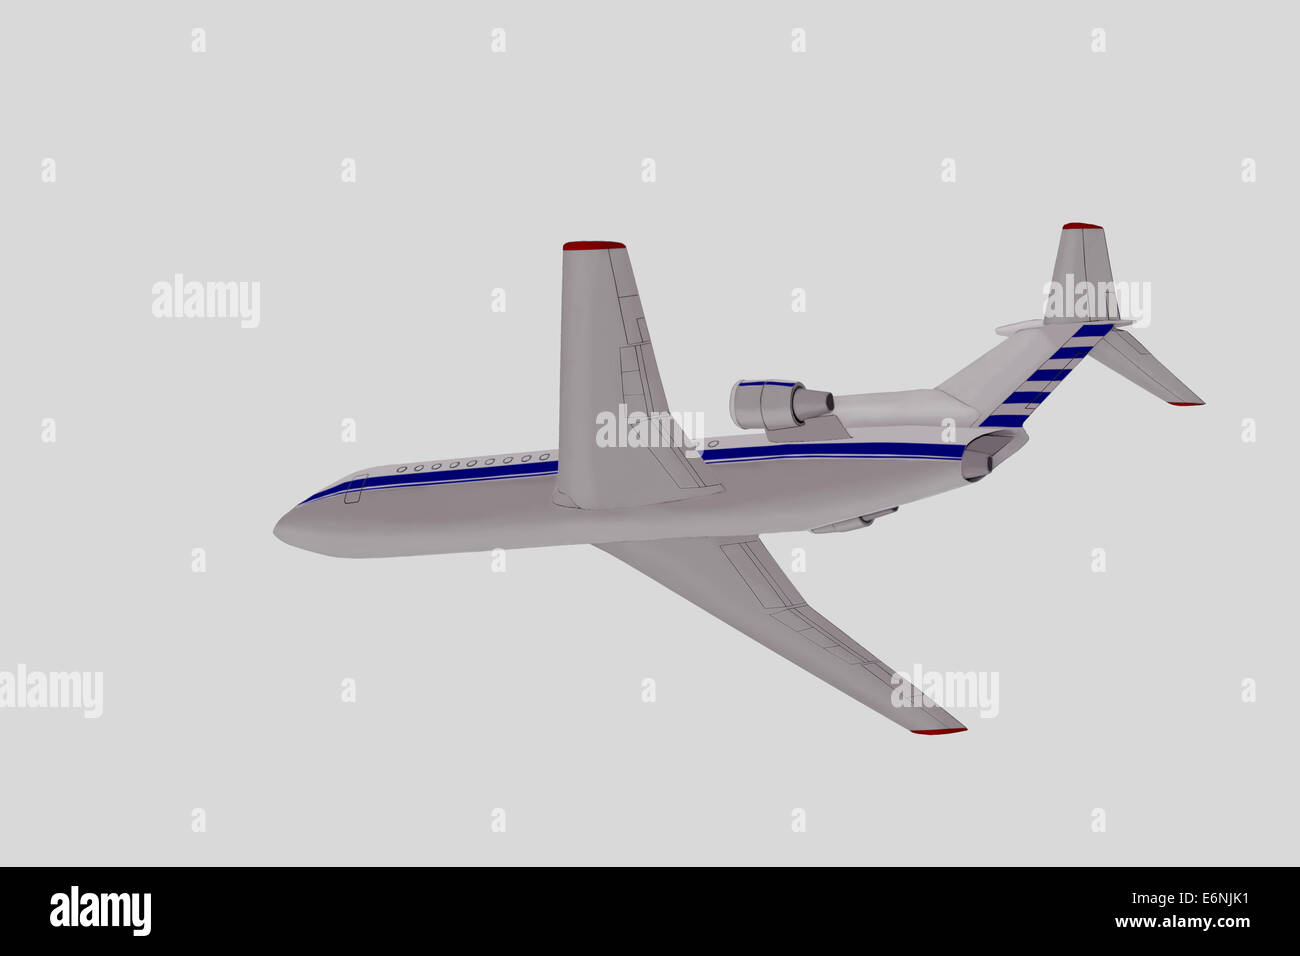 Flugzeug, Flugzeug, Modell, isoliert, Flugzeug, Papier, Spielzeug, weiß, Transport, Flugzeuge, Objekt, Luftfahrt, Stockbild